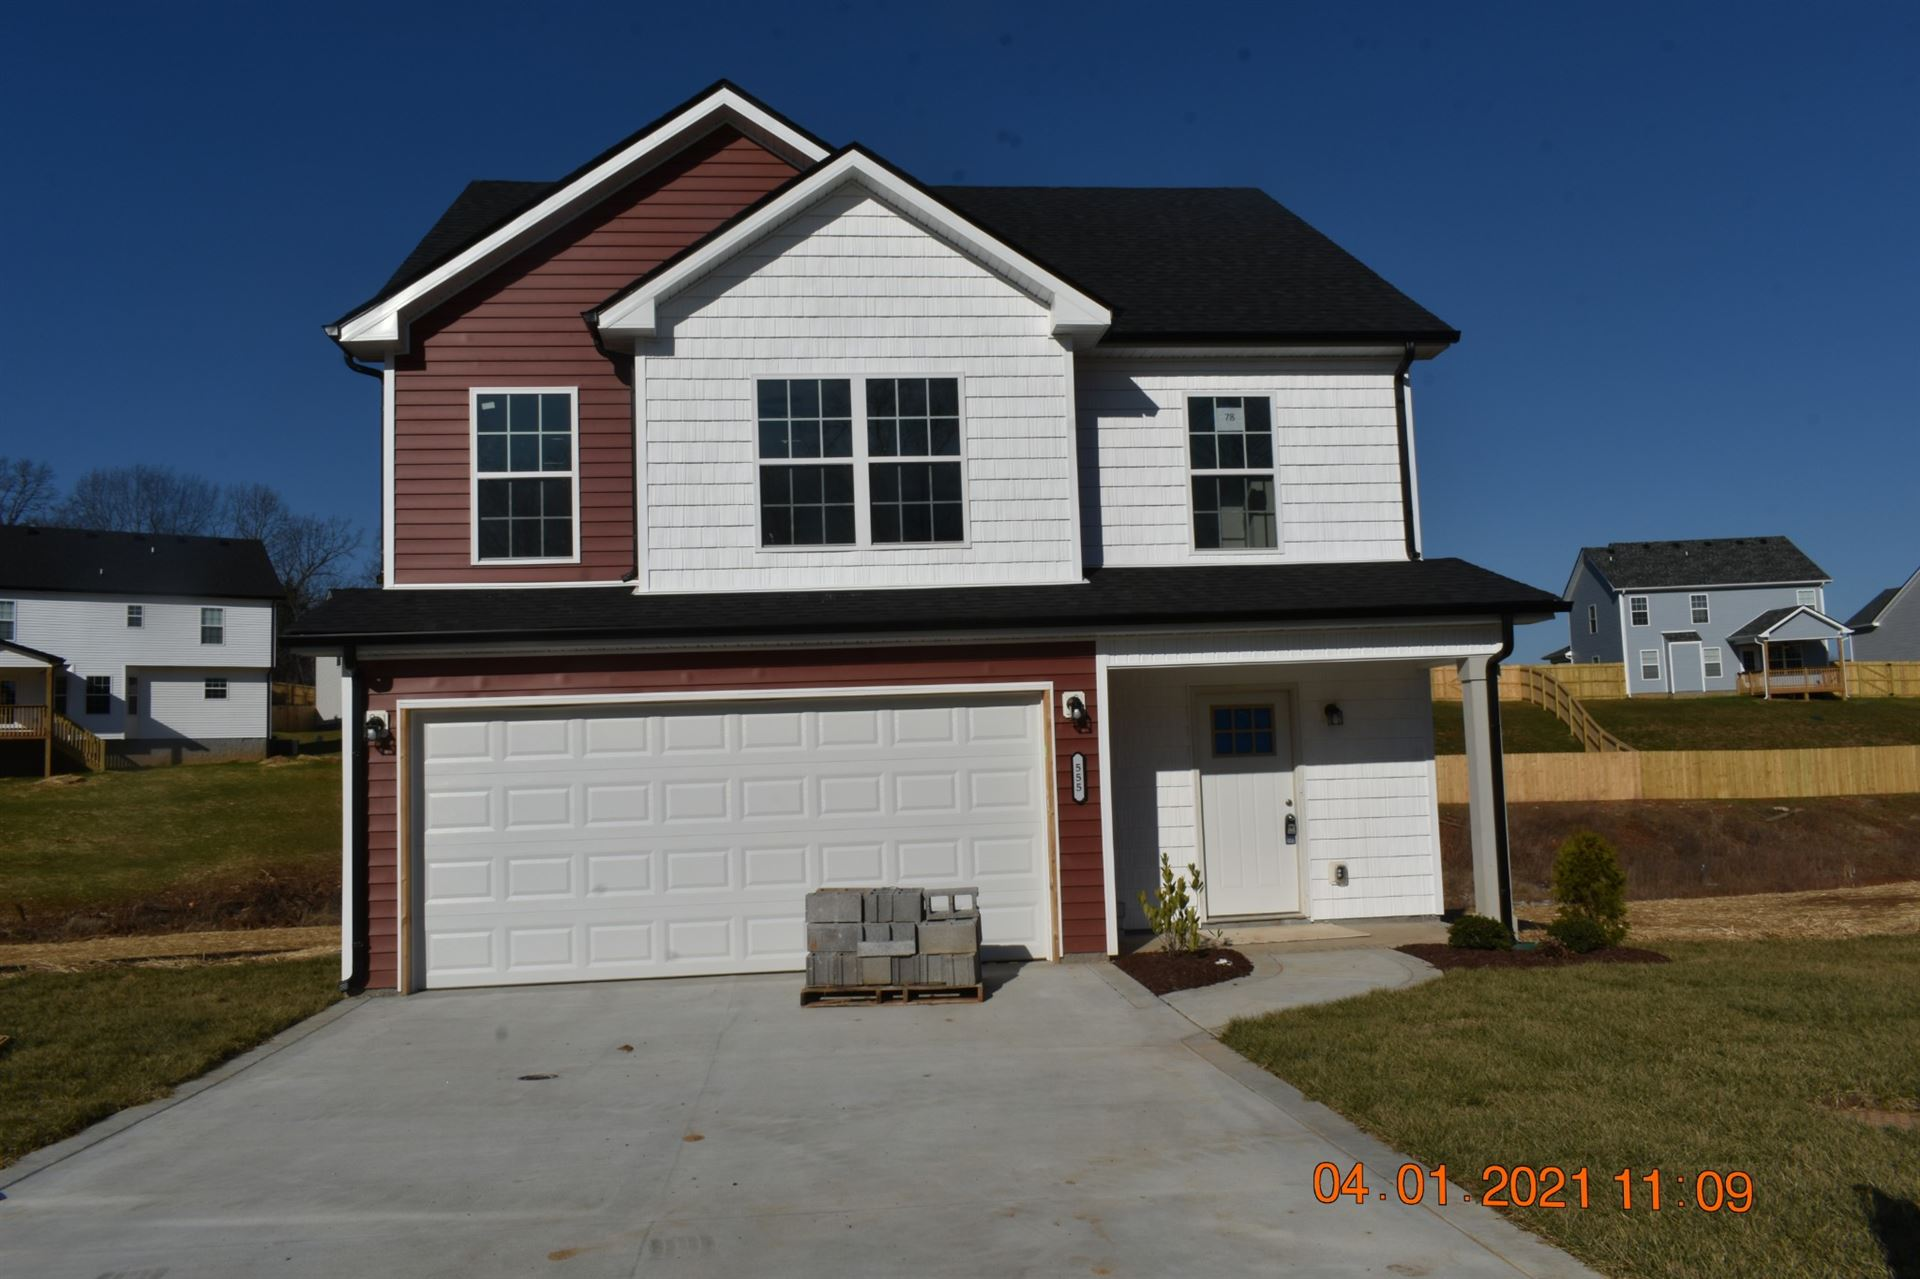 78 Chestnut Hill, Clarksville, TN 37042 - MLS#: 2184787